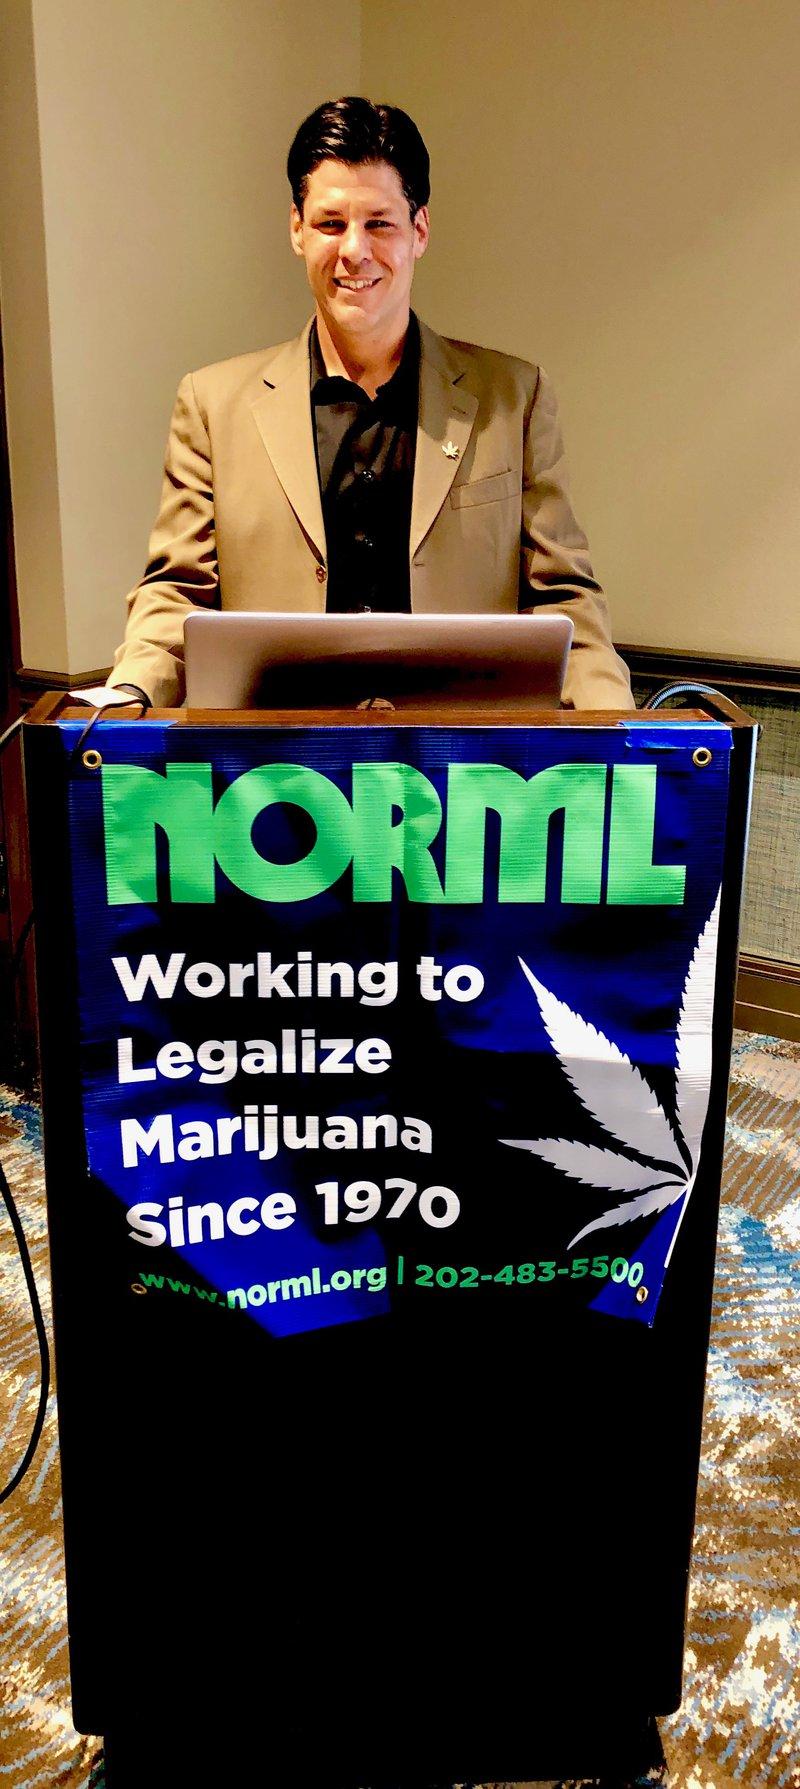 Greg NORML